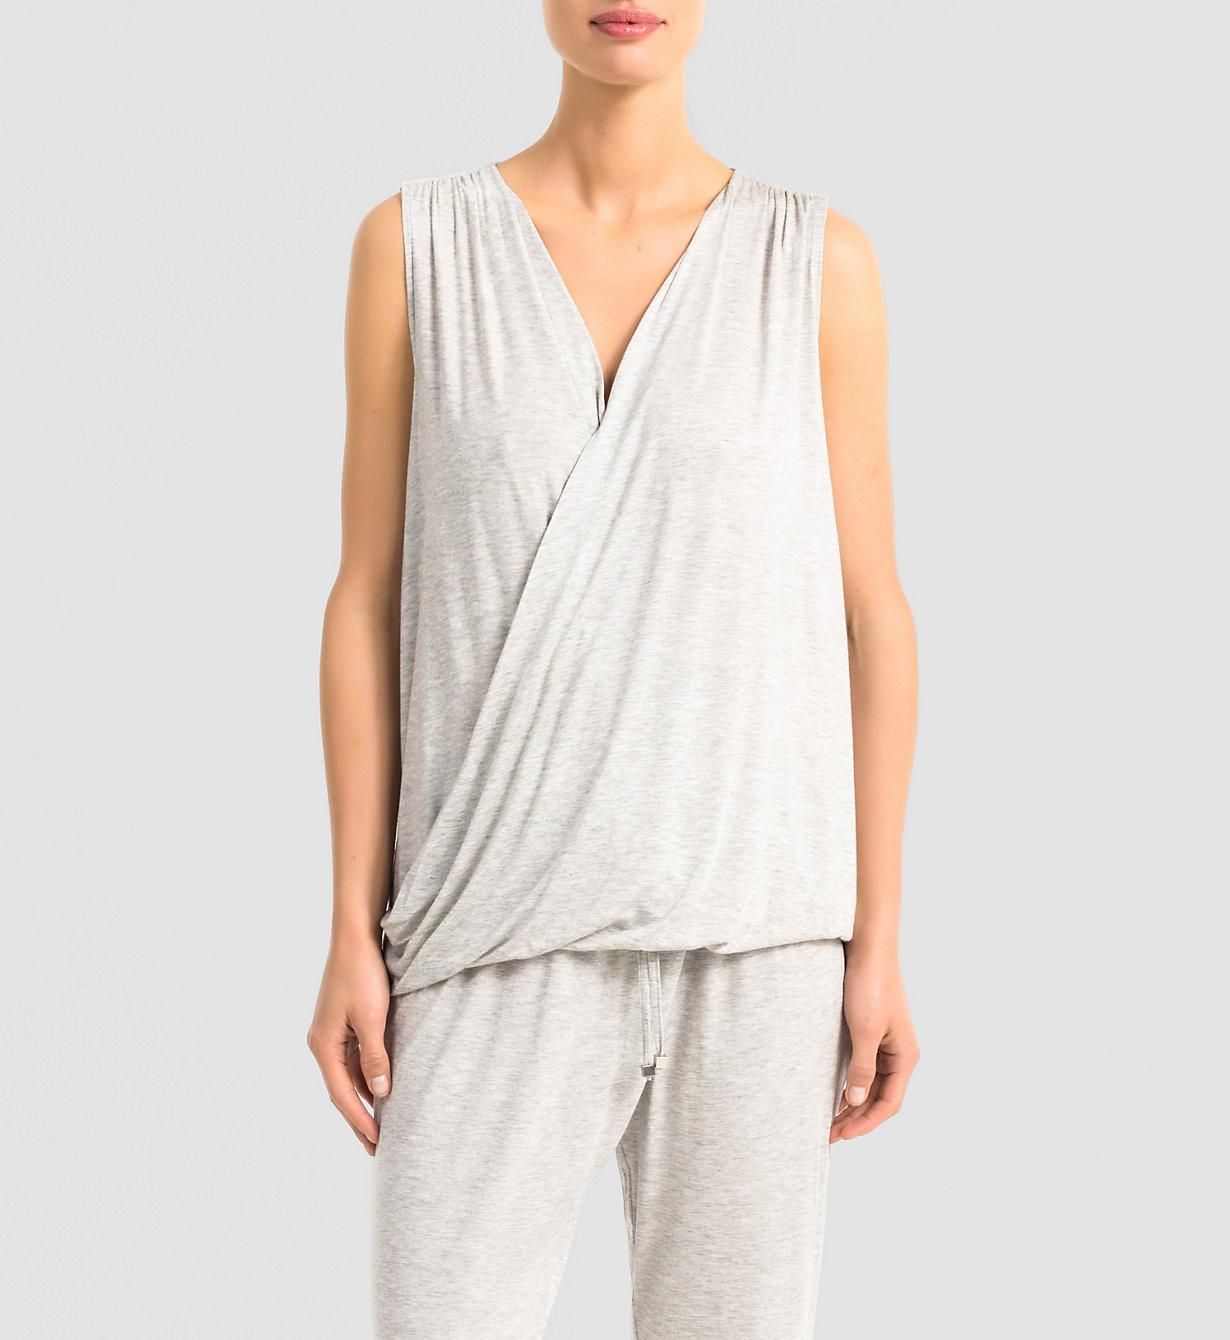 Dámské tričko Release QS5715E - Calvin Klein Barva: modrá, Velikost: S